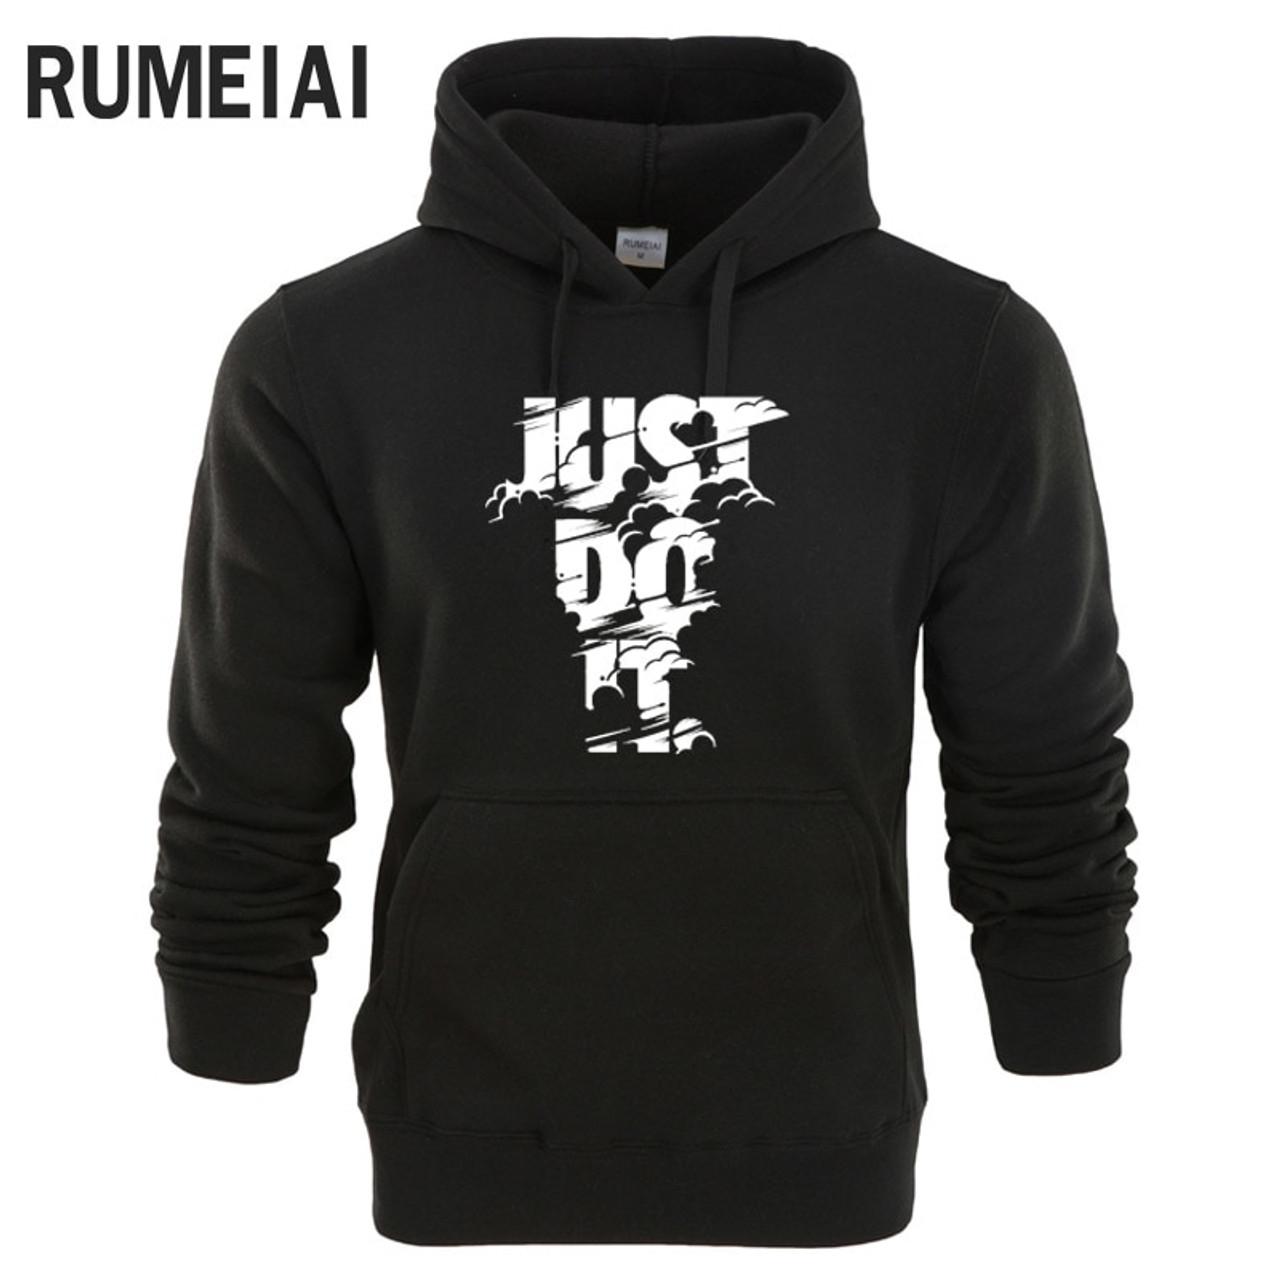 d924aa1965 RUMEIAI hoodie Men Letter 3D print Hip Hop Sweatshirt fashion Mens hoodie  2017 brand Winter Cotton pullover male hoody Moleton